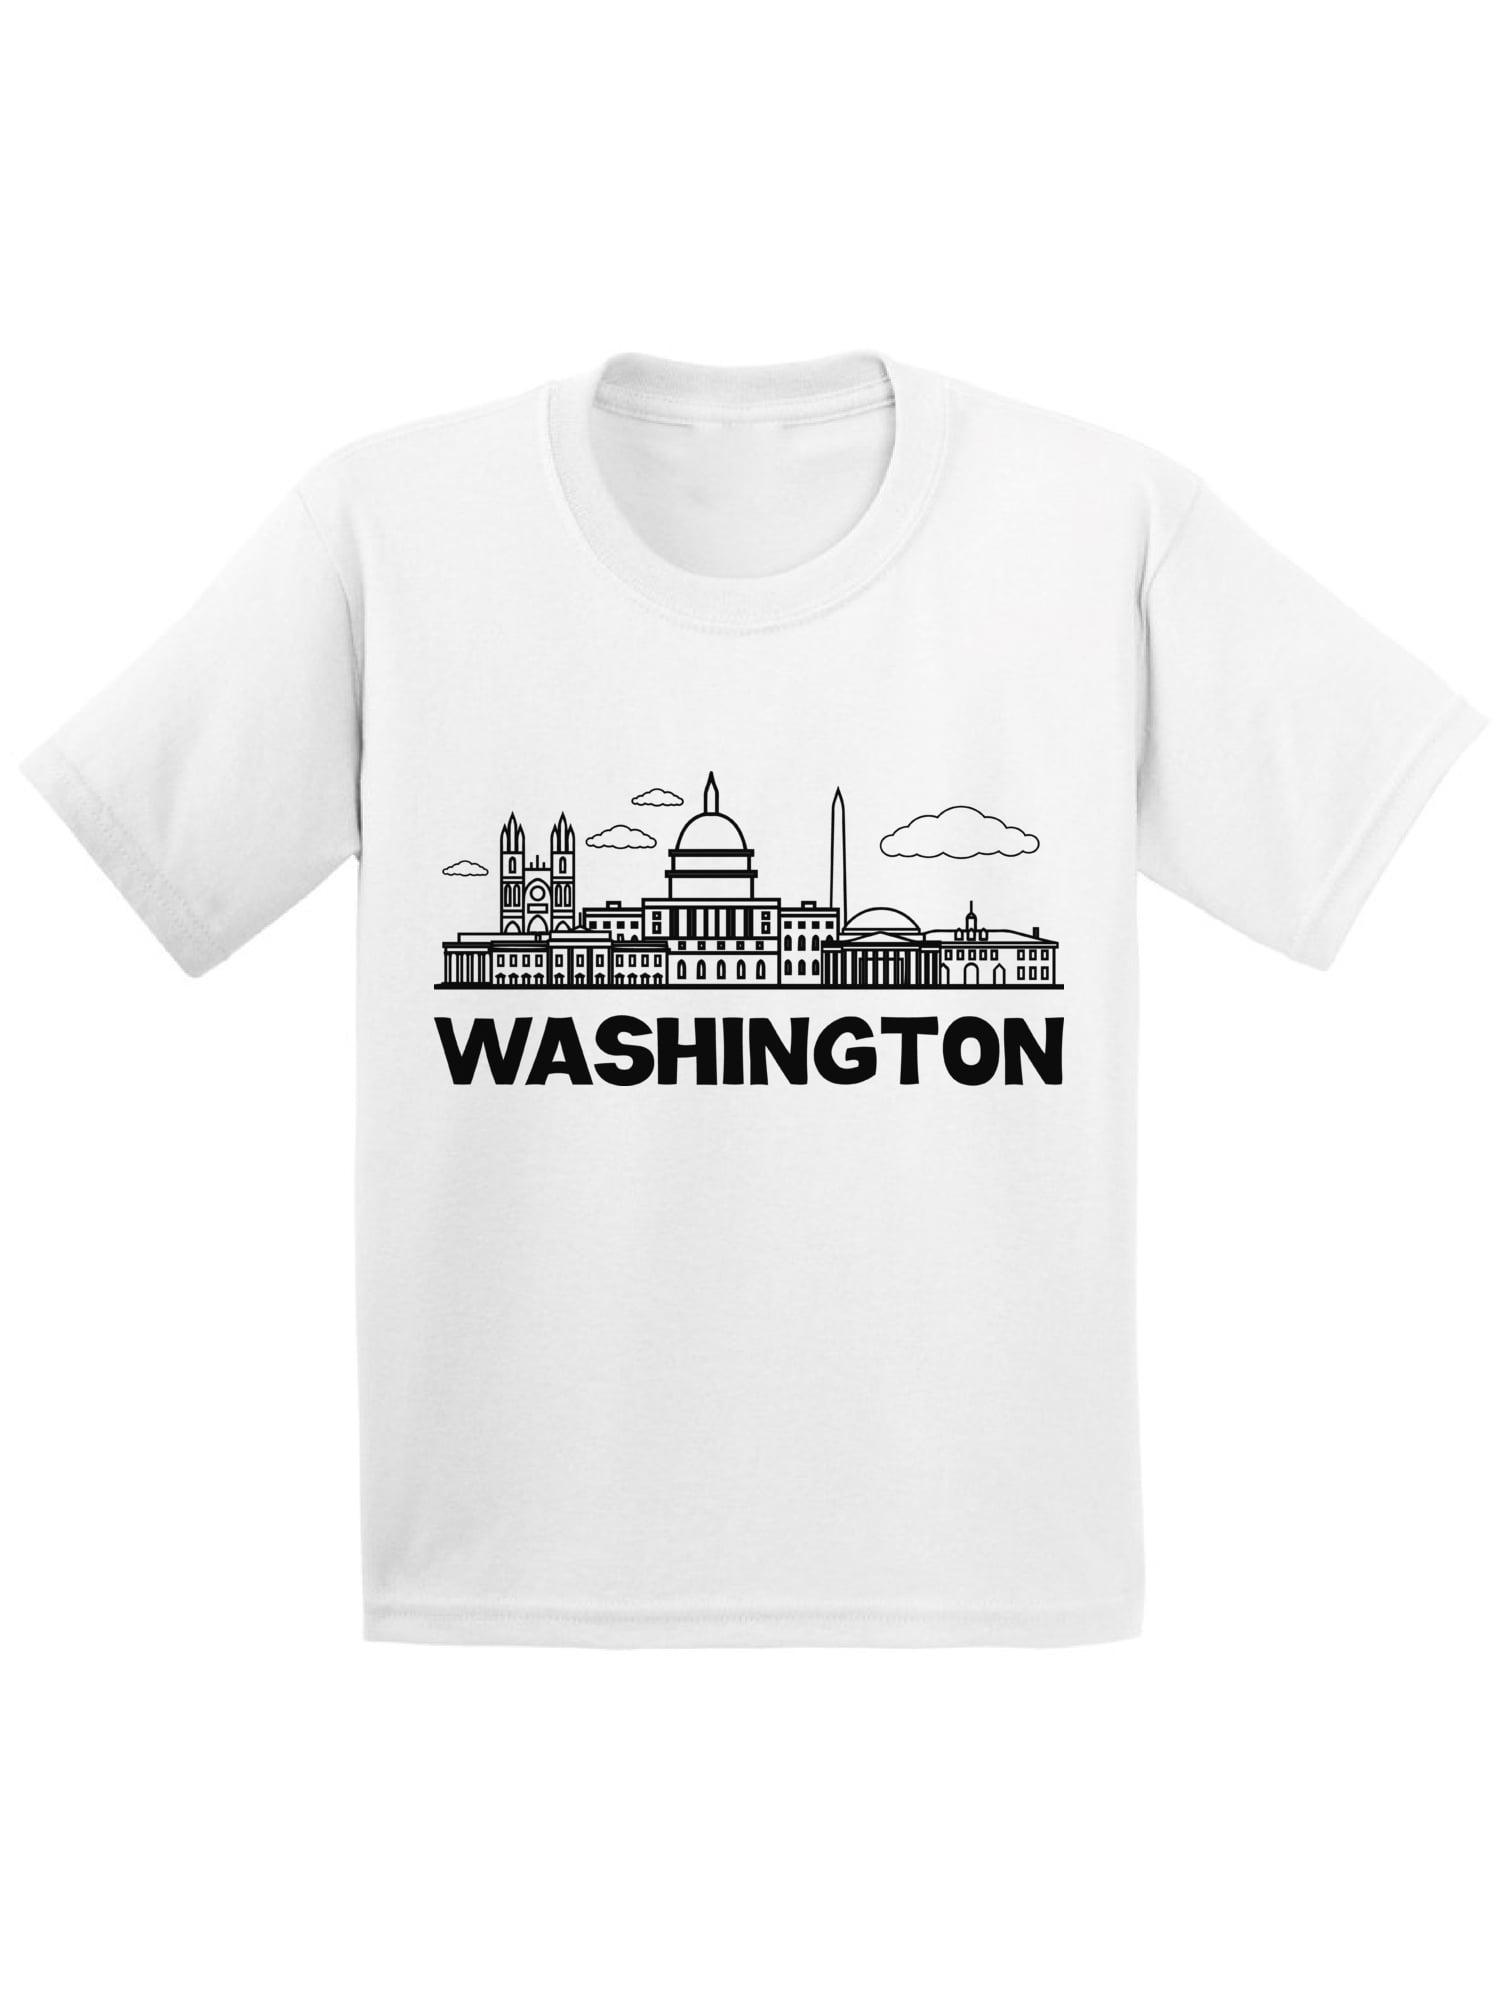 T-Shirt & Apparel Printing Underground Printing - UGP